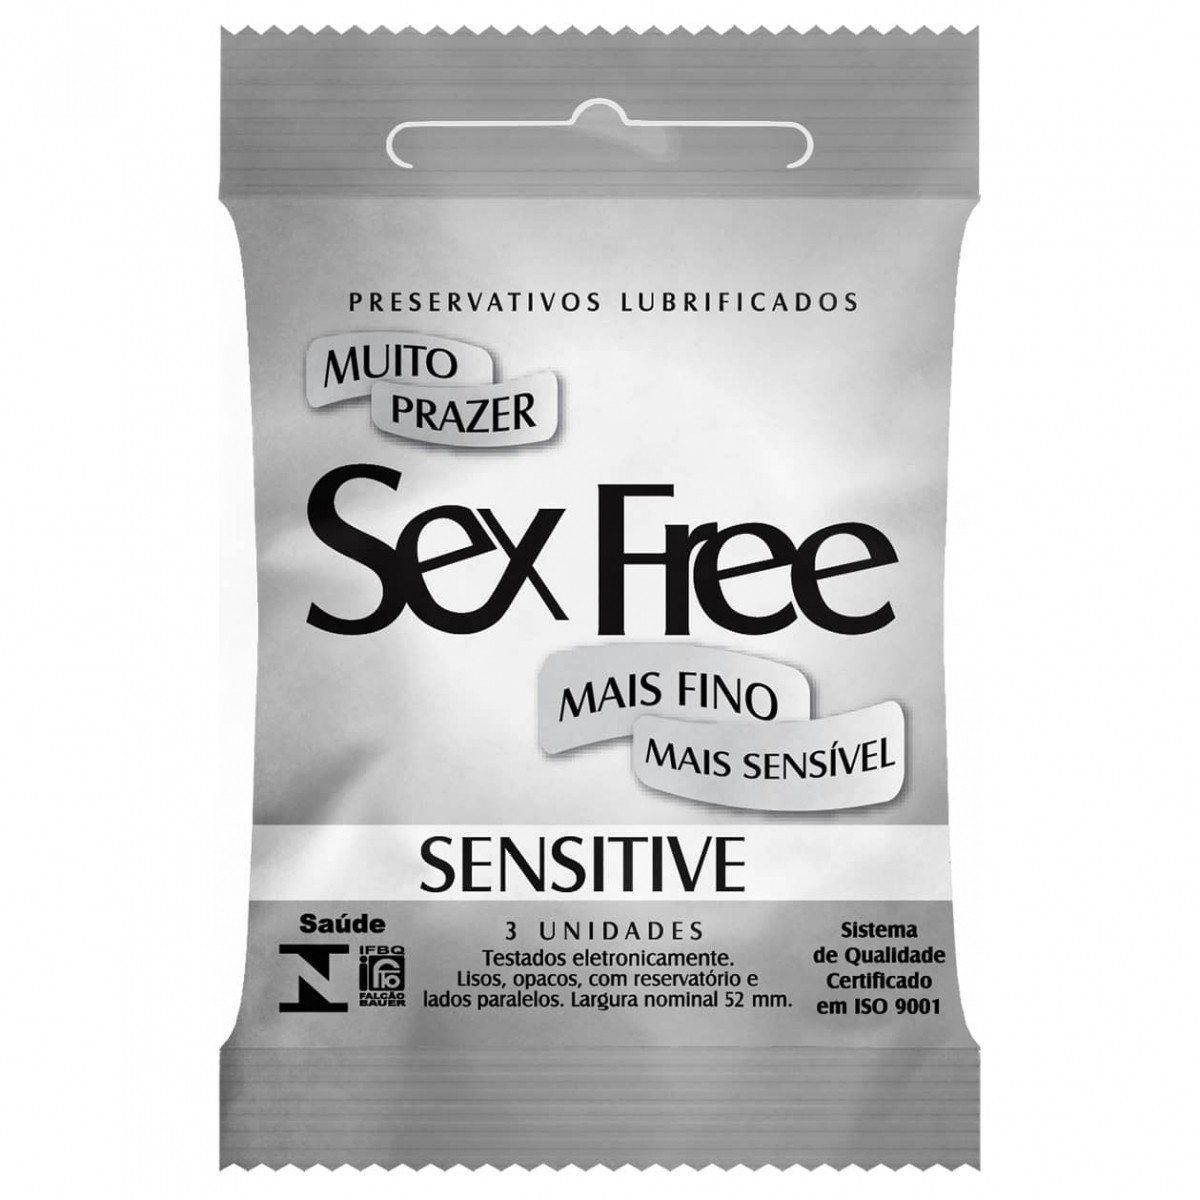 Preservativo Sex Free Sensitive + Fino + Sensibilidade 3 Unidades